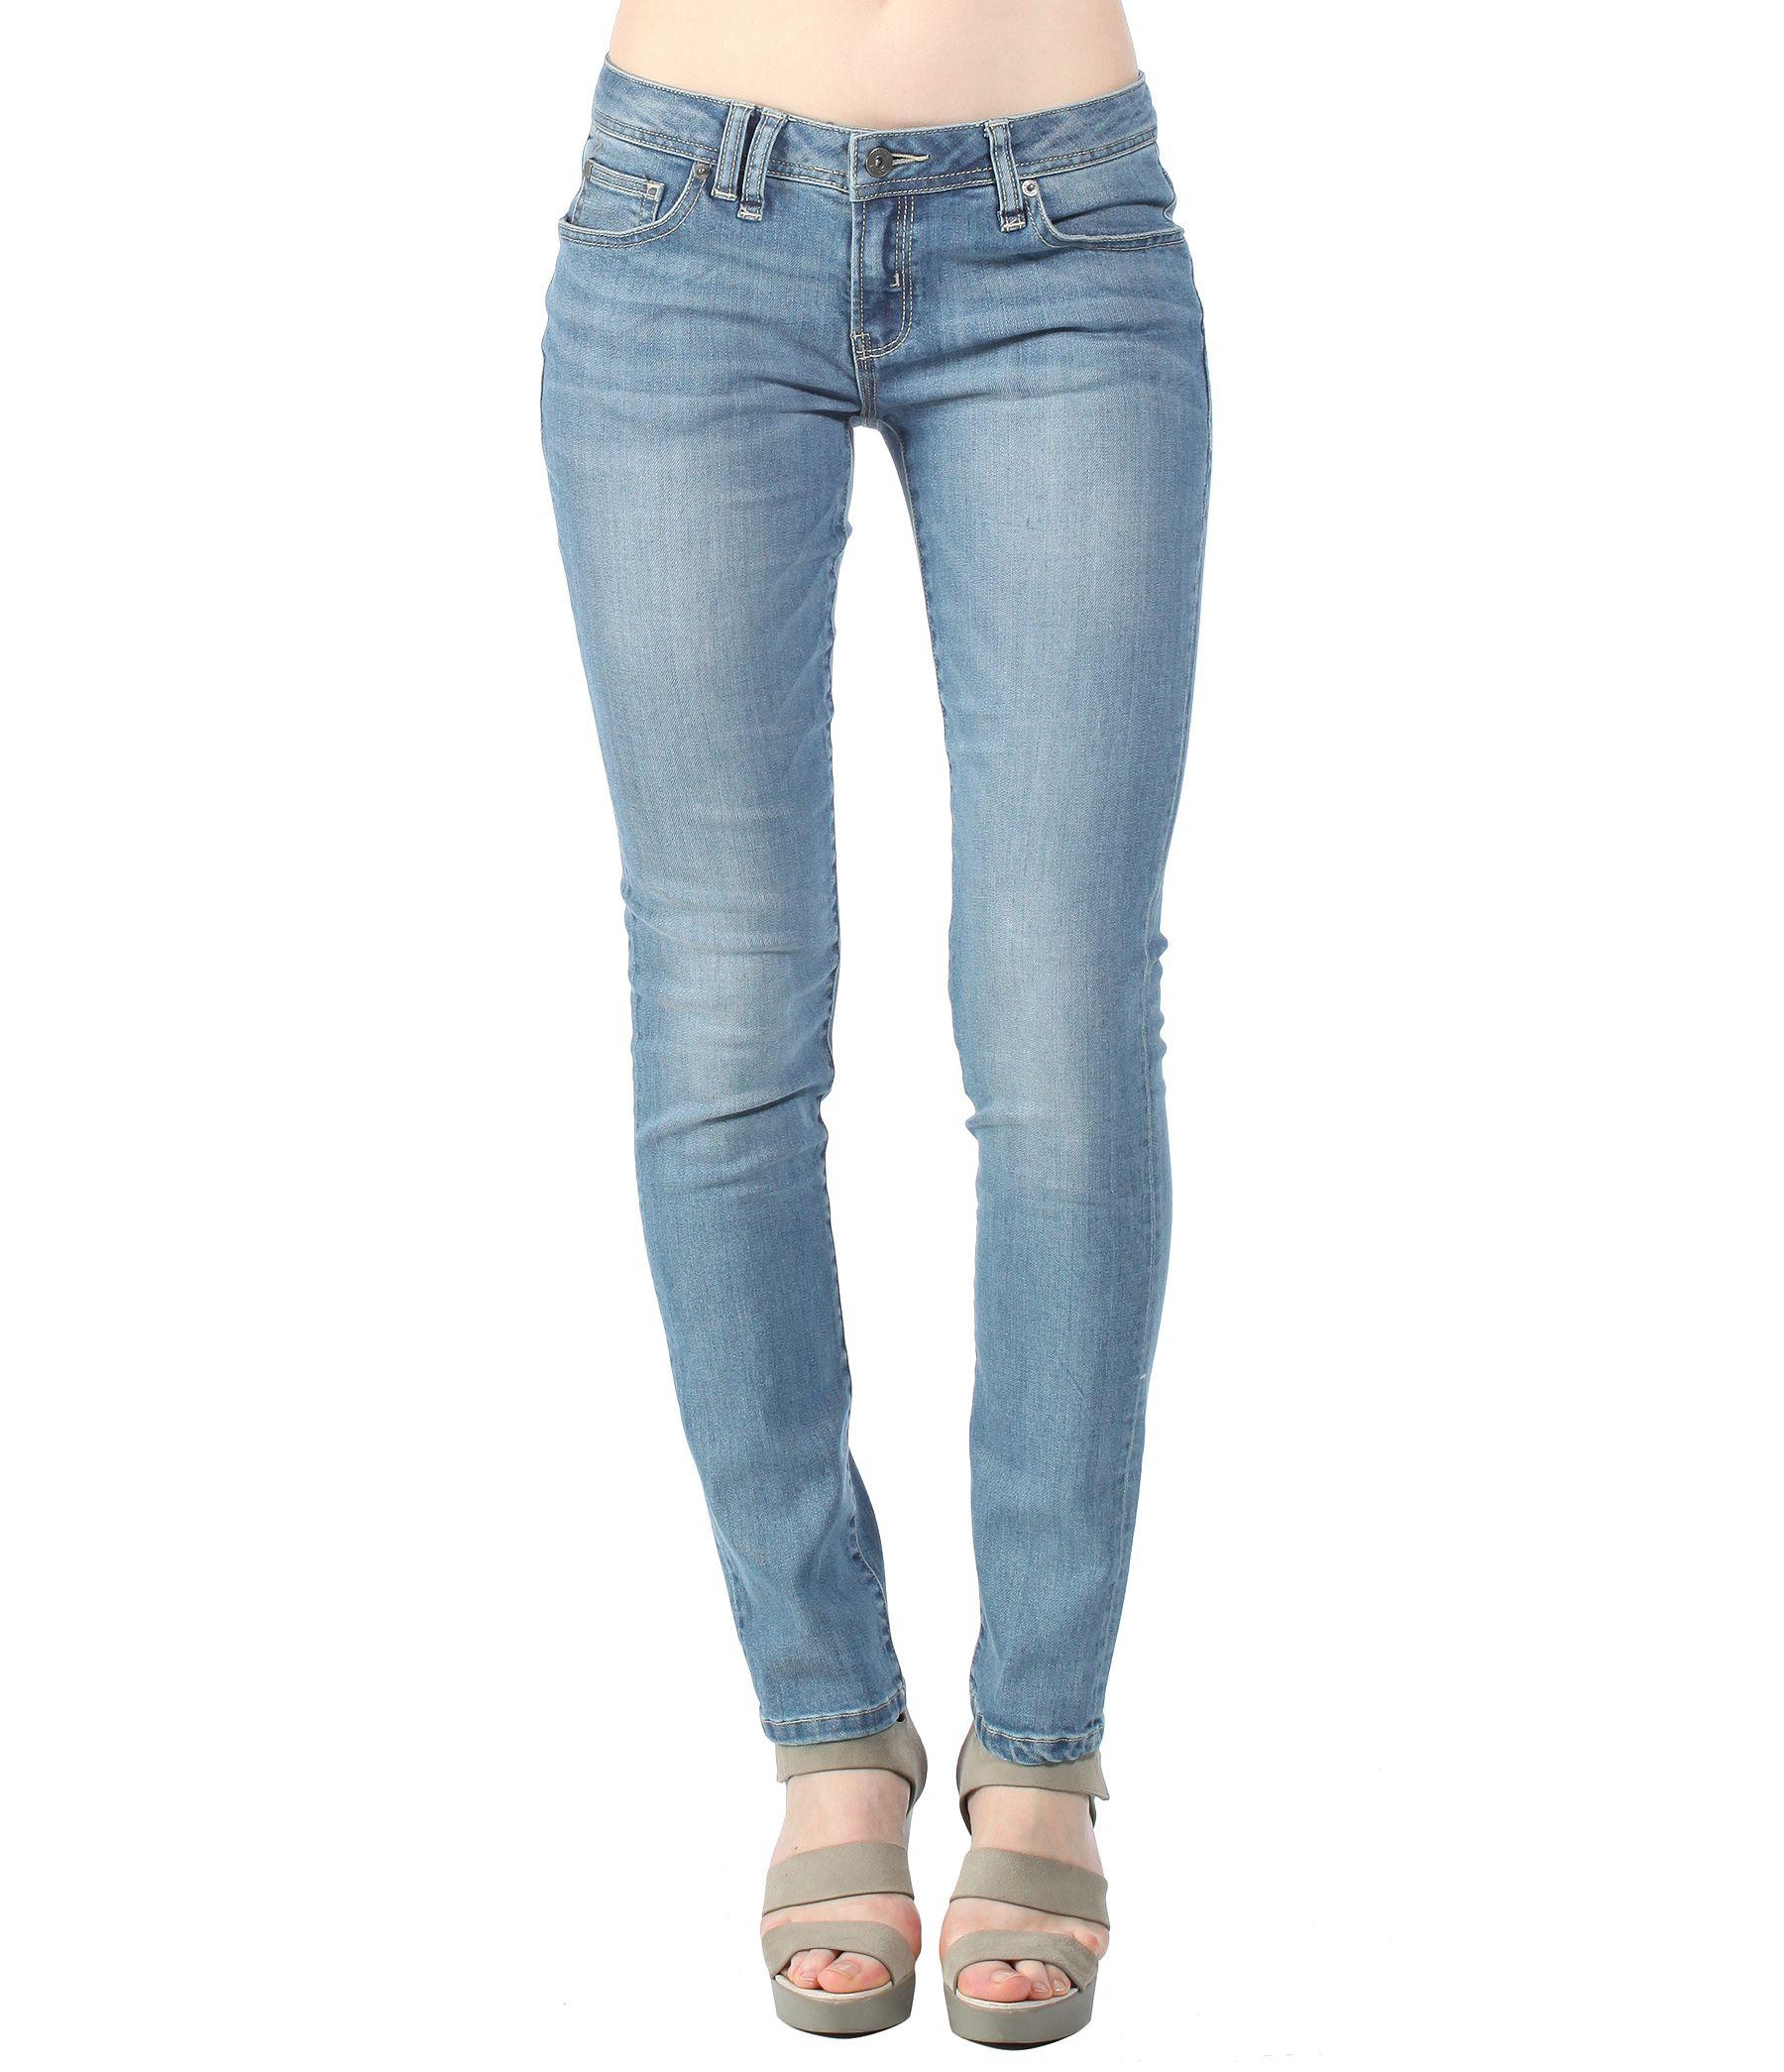 bench fret v17 slim fit jeans in blue lyst